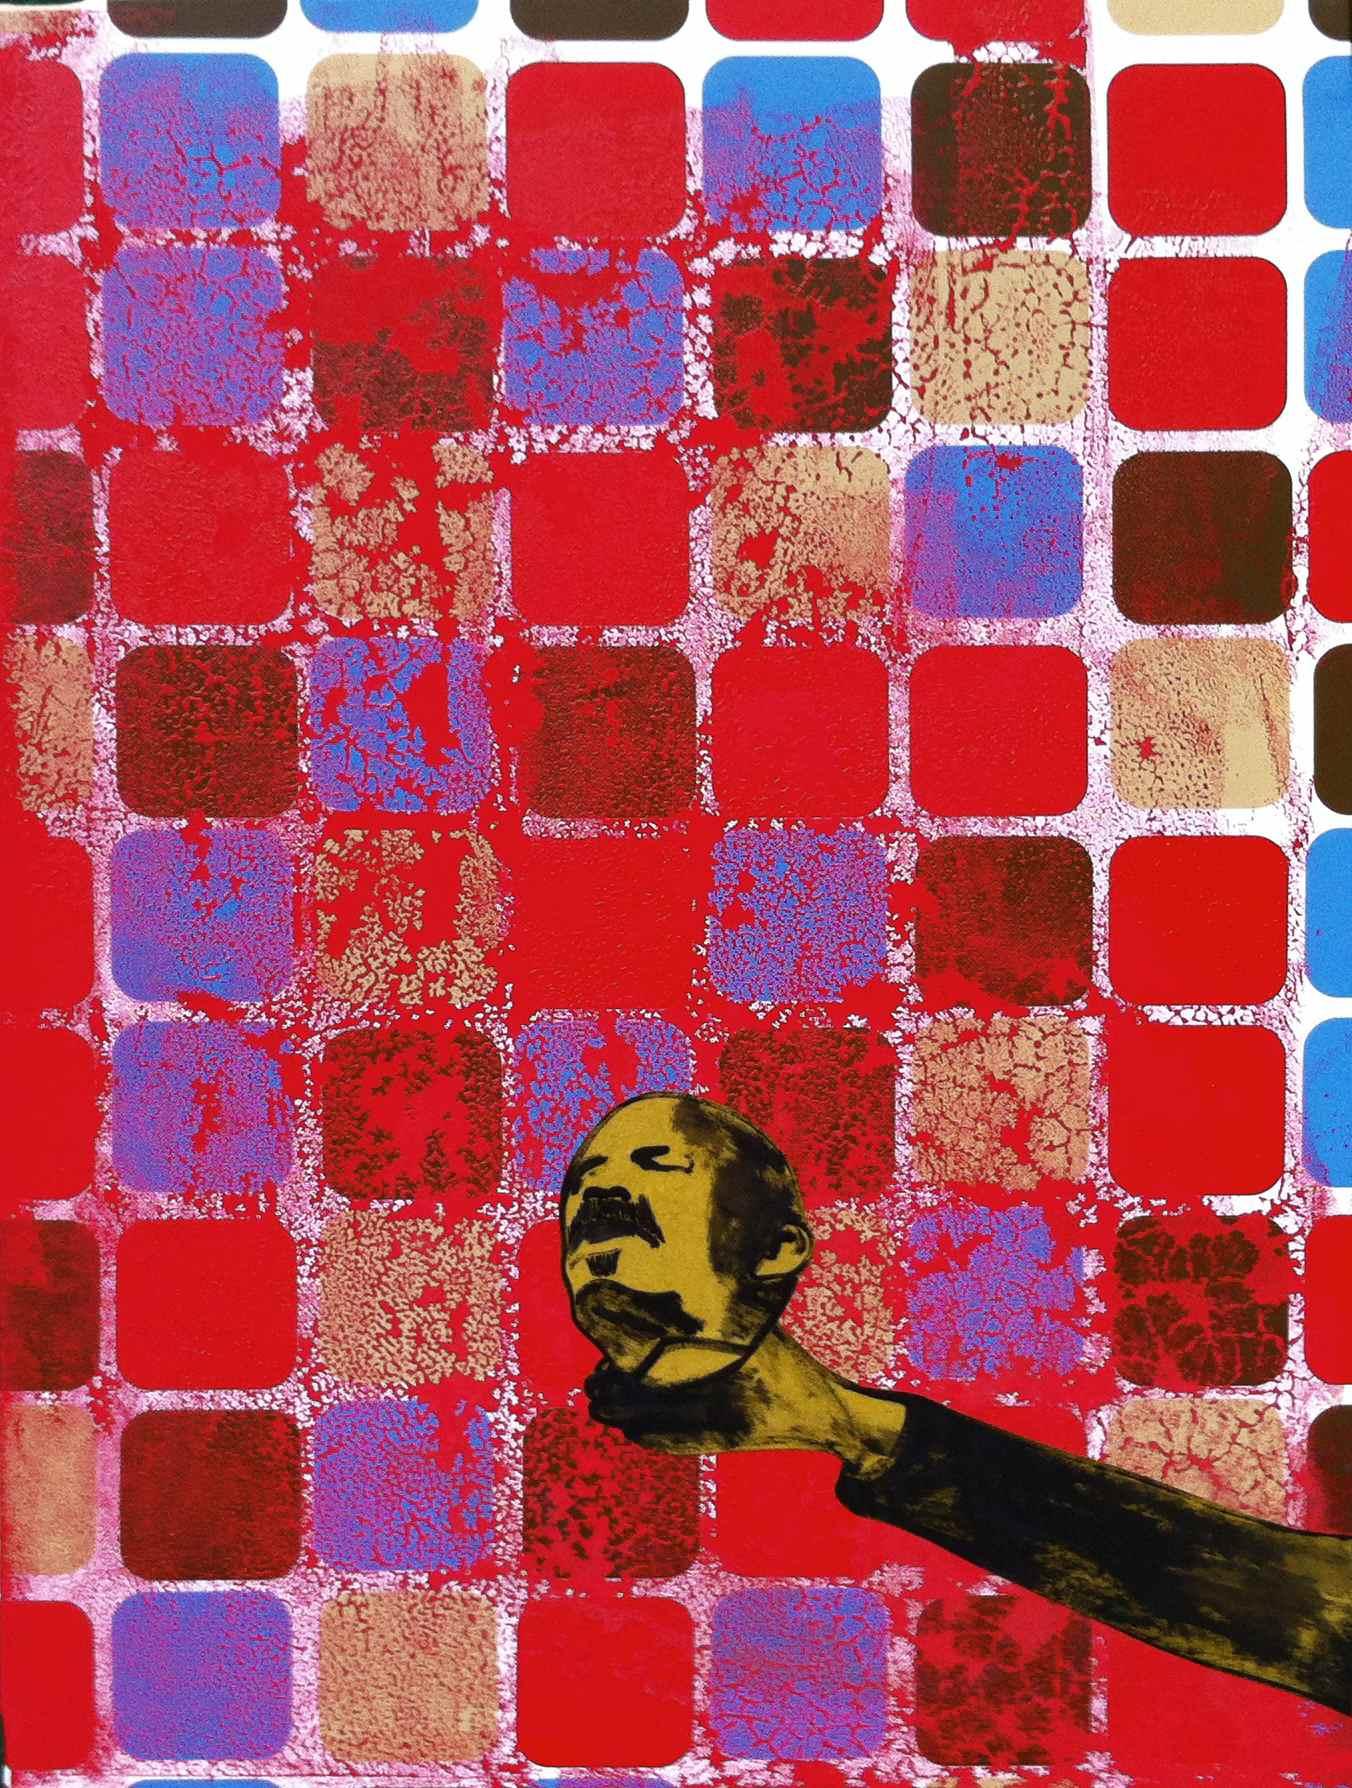 Michael Rotondi, Lenin's death, 2013, mixed media on canvas, 80x60cm